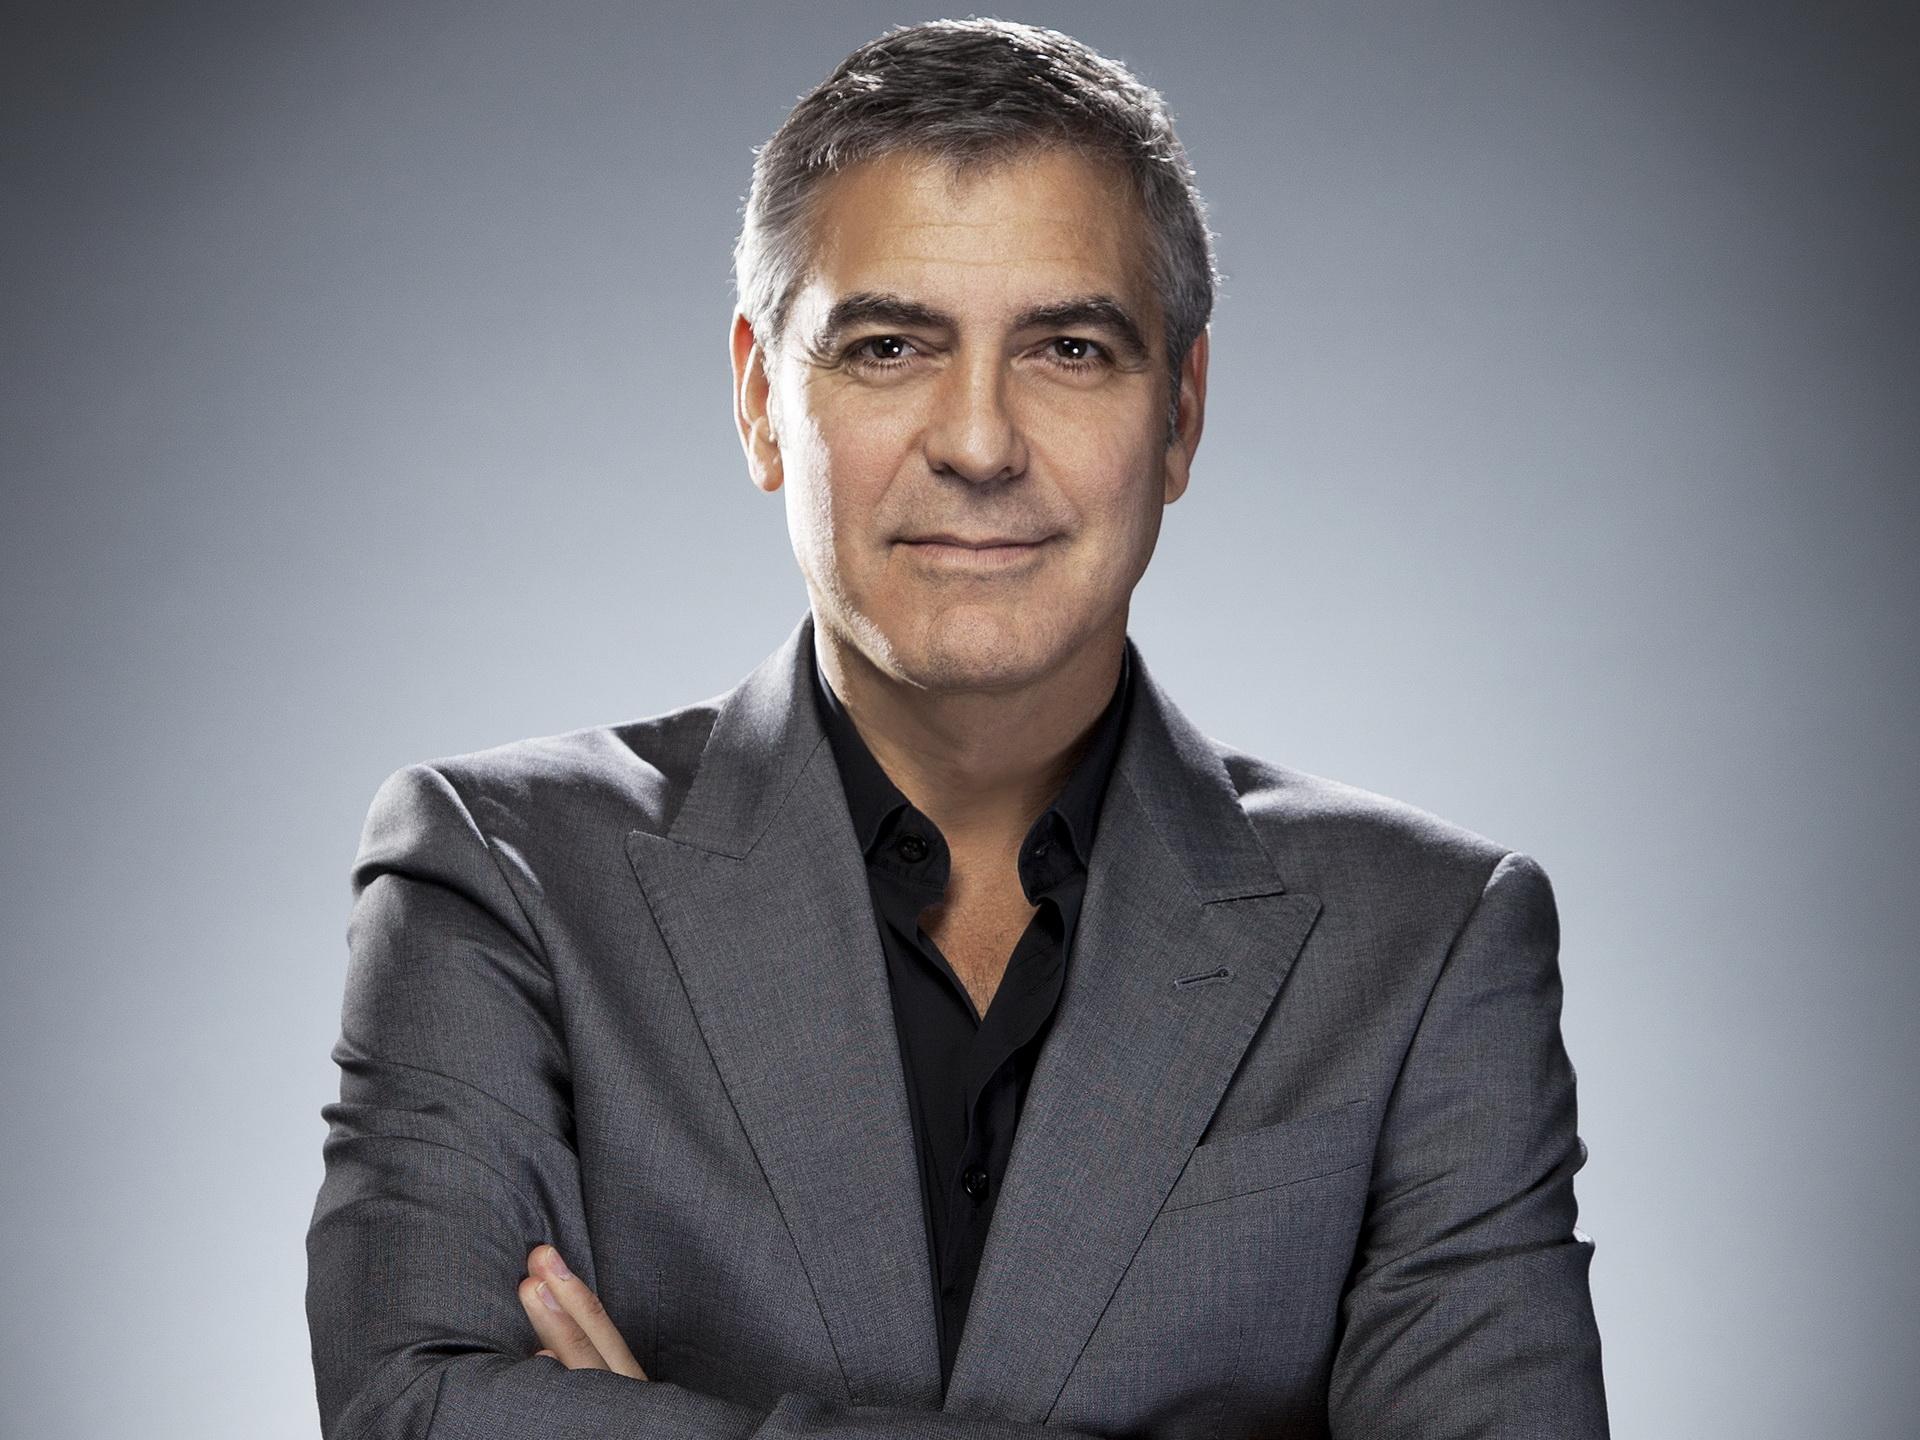 George Clooney Promo Still